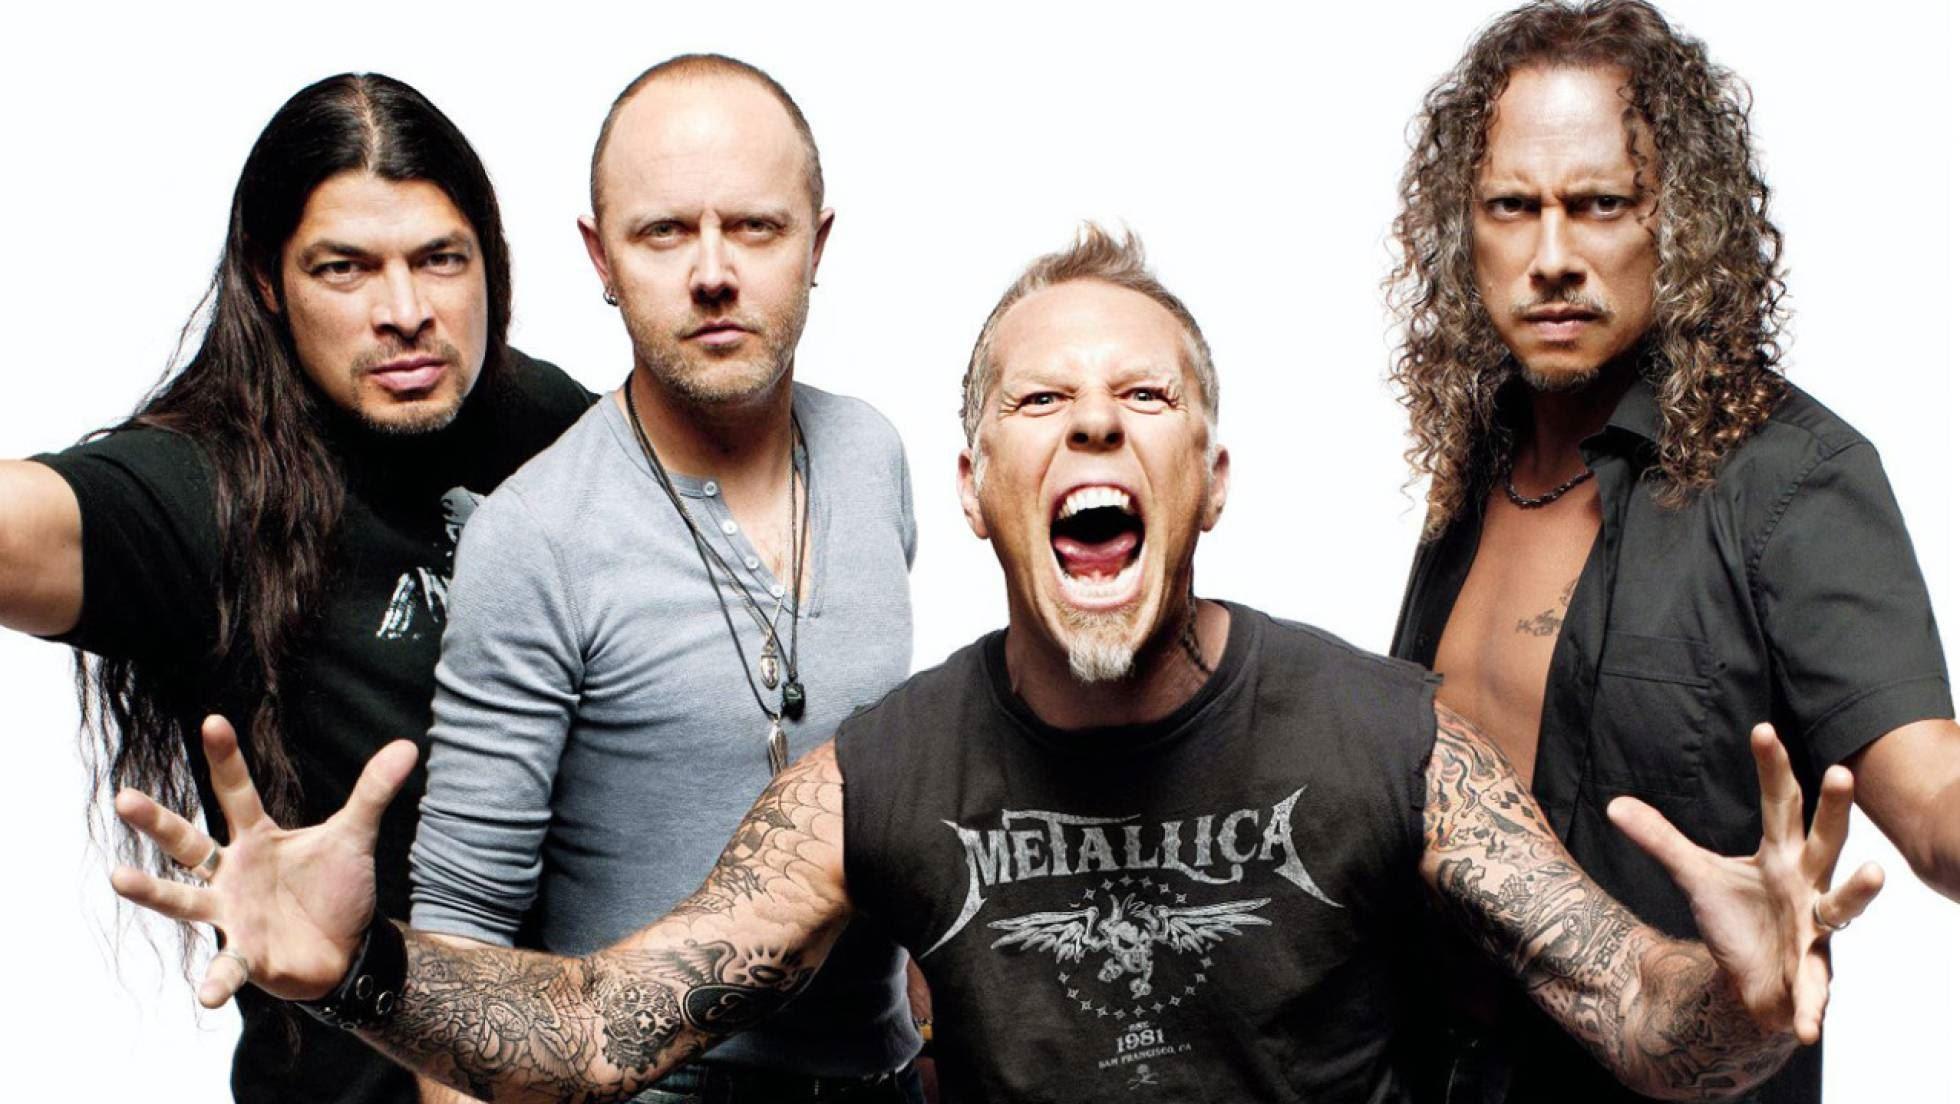 Metalheads: 2019 promete!